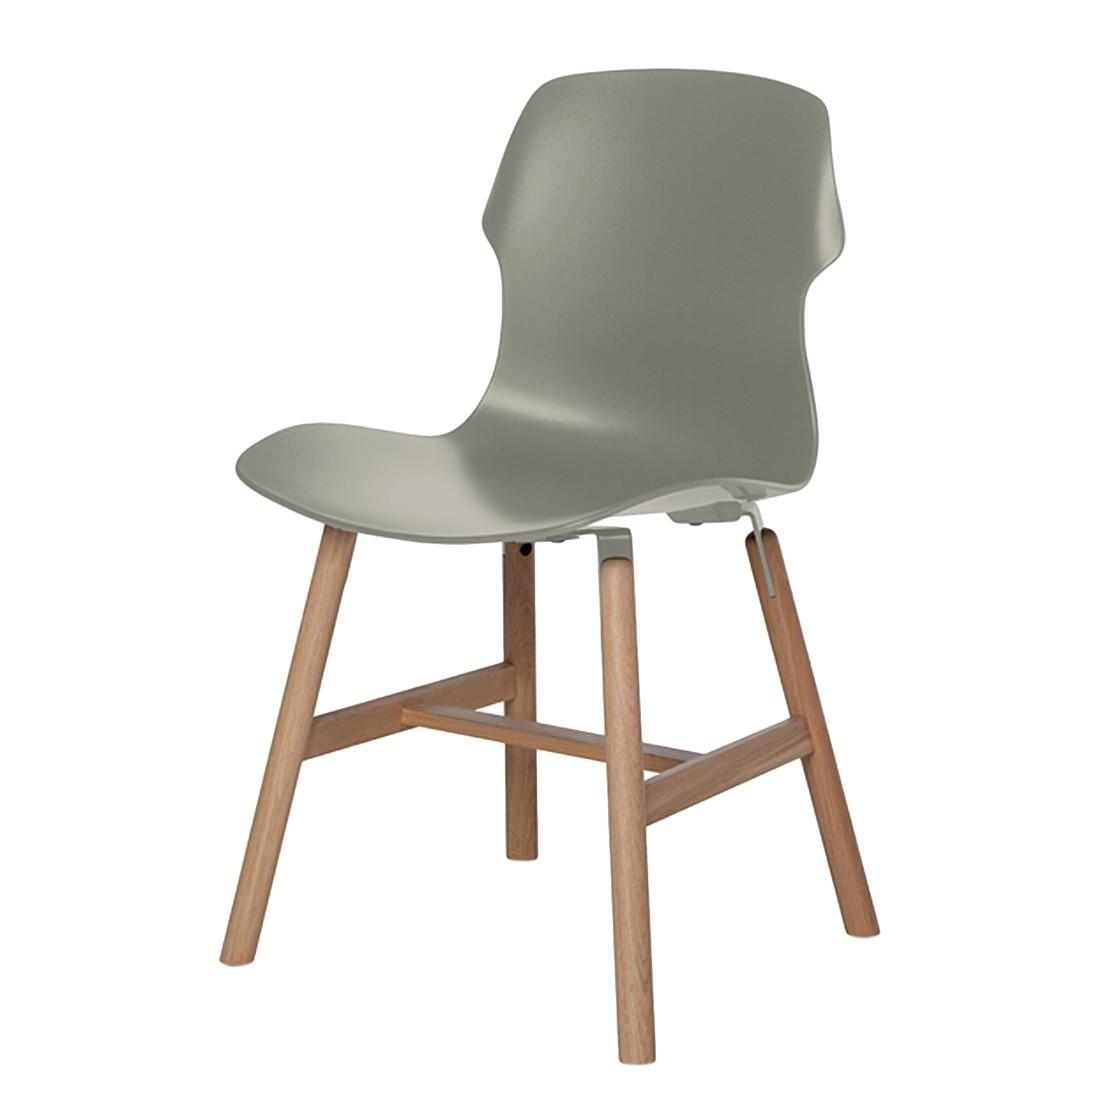 Stuhl Stereo Wood (2er-Set) – Kunststoff Hellgrau/Eiche massiv, Casamania günstig